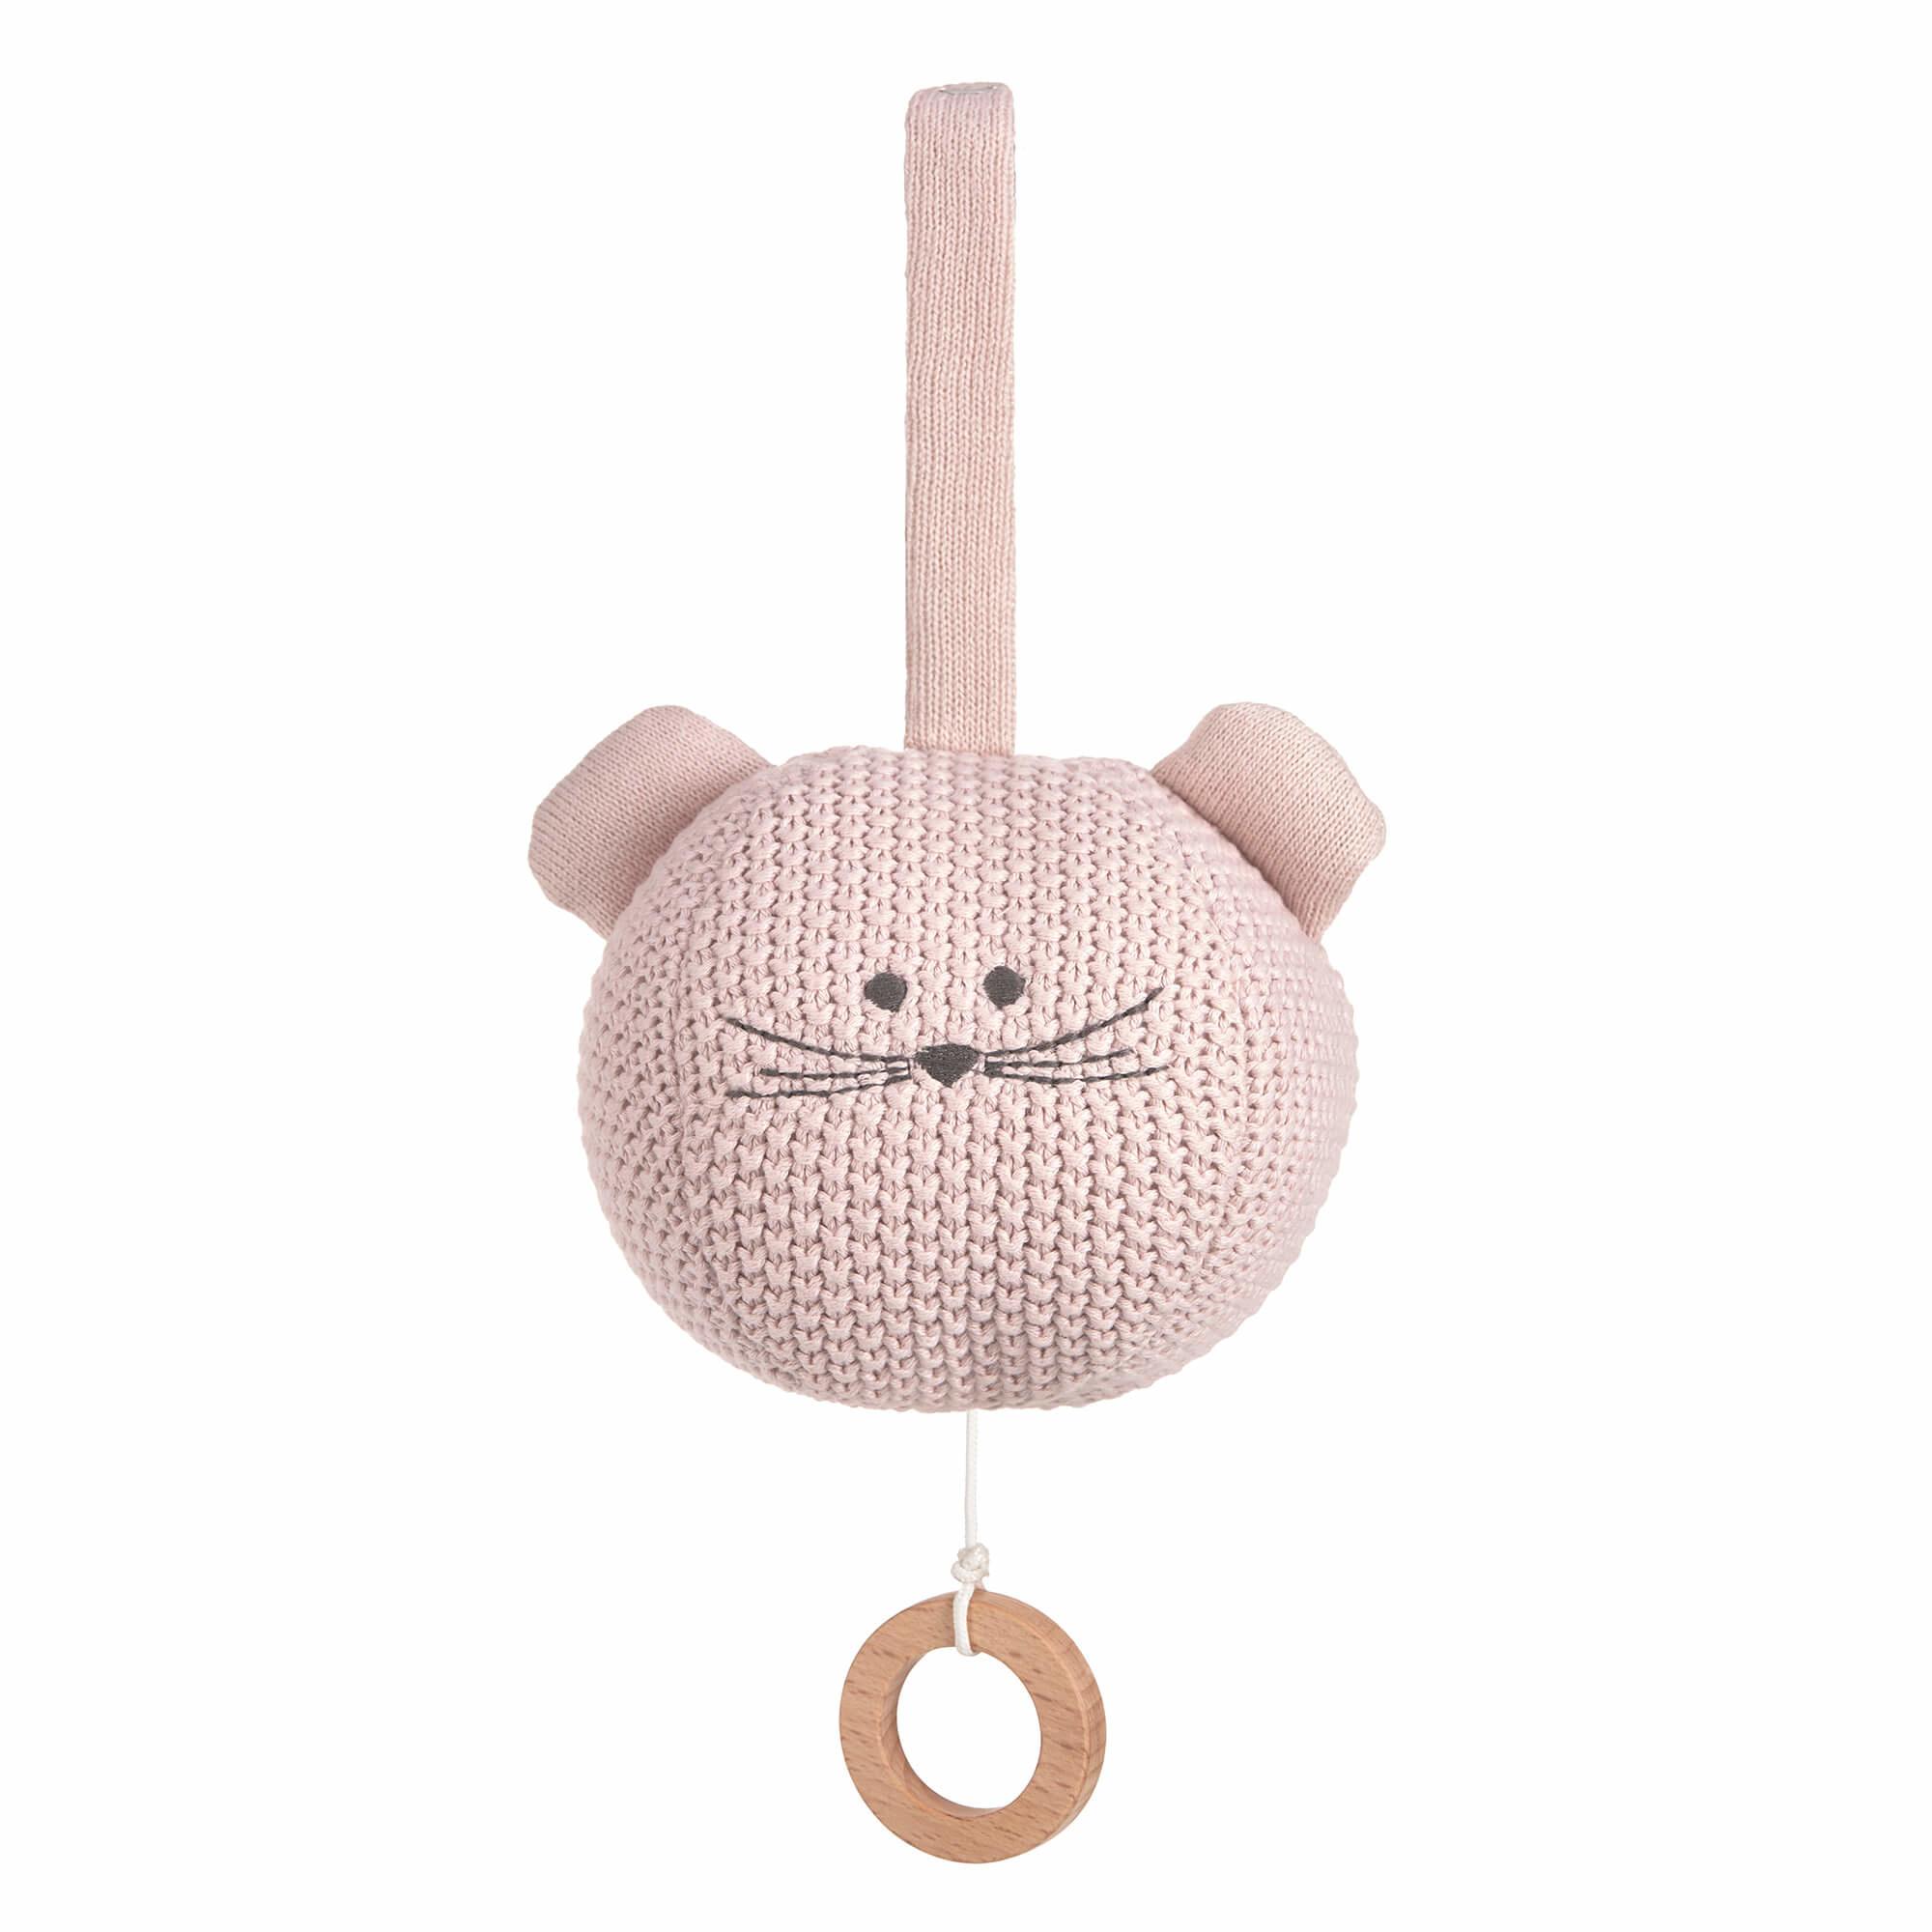 Lässig gebreide muziek mobiel, 100% organic cotton, Little Chums Mouse